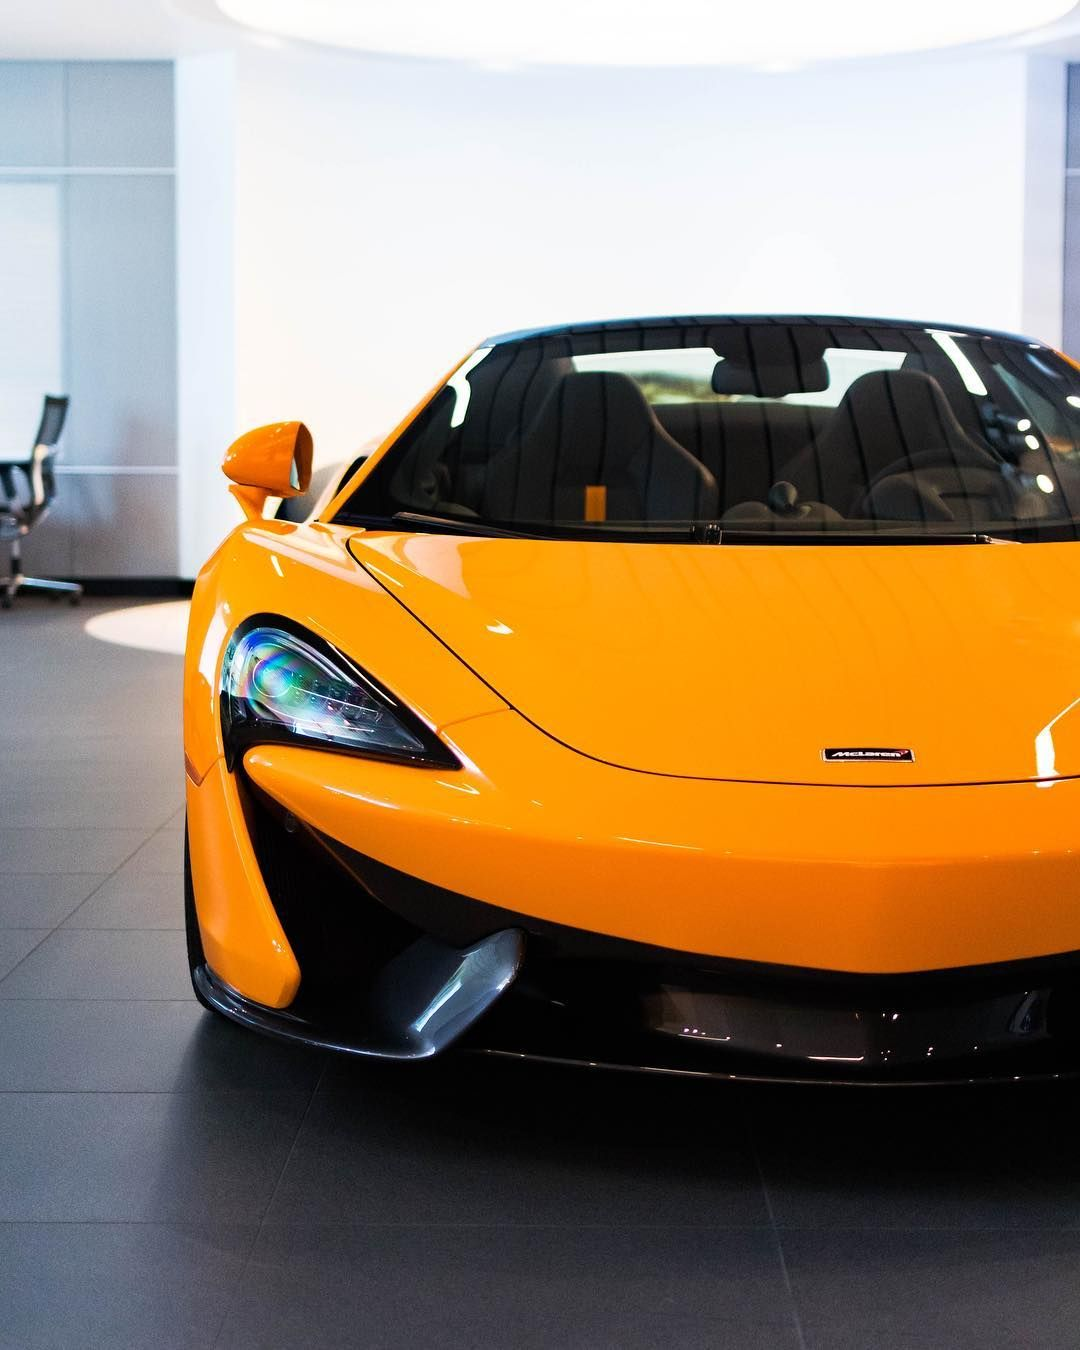 Pin By Twala On Luxury Cars Orange Car Chasing Cars Super Cars